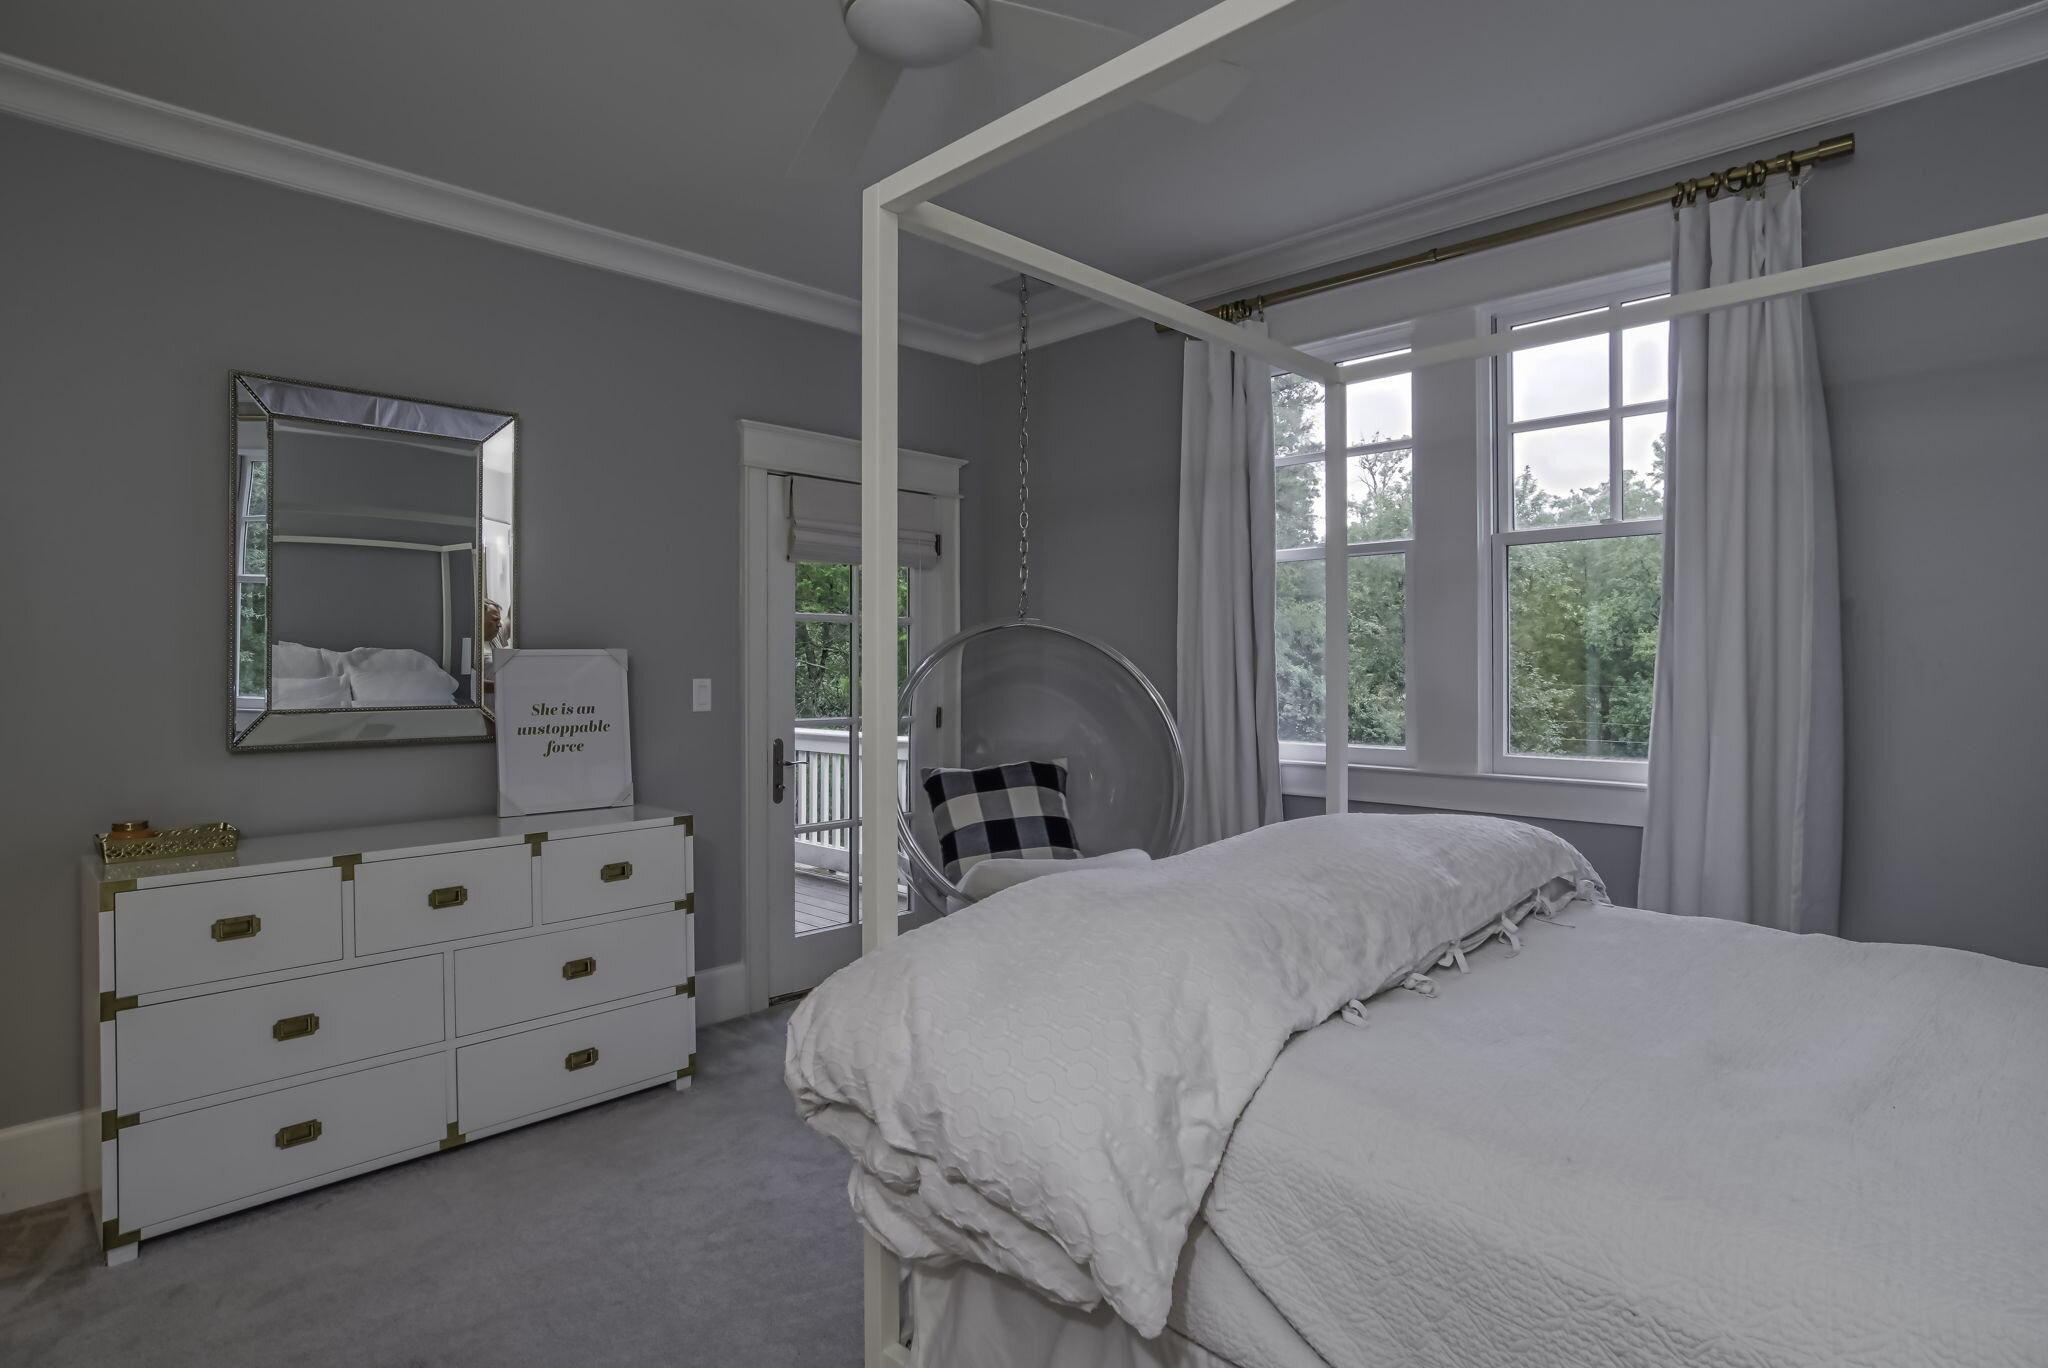 34-web-or-mls-4900 Carmel Park Dr Bedroom 3 2.jpg